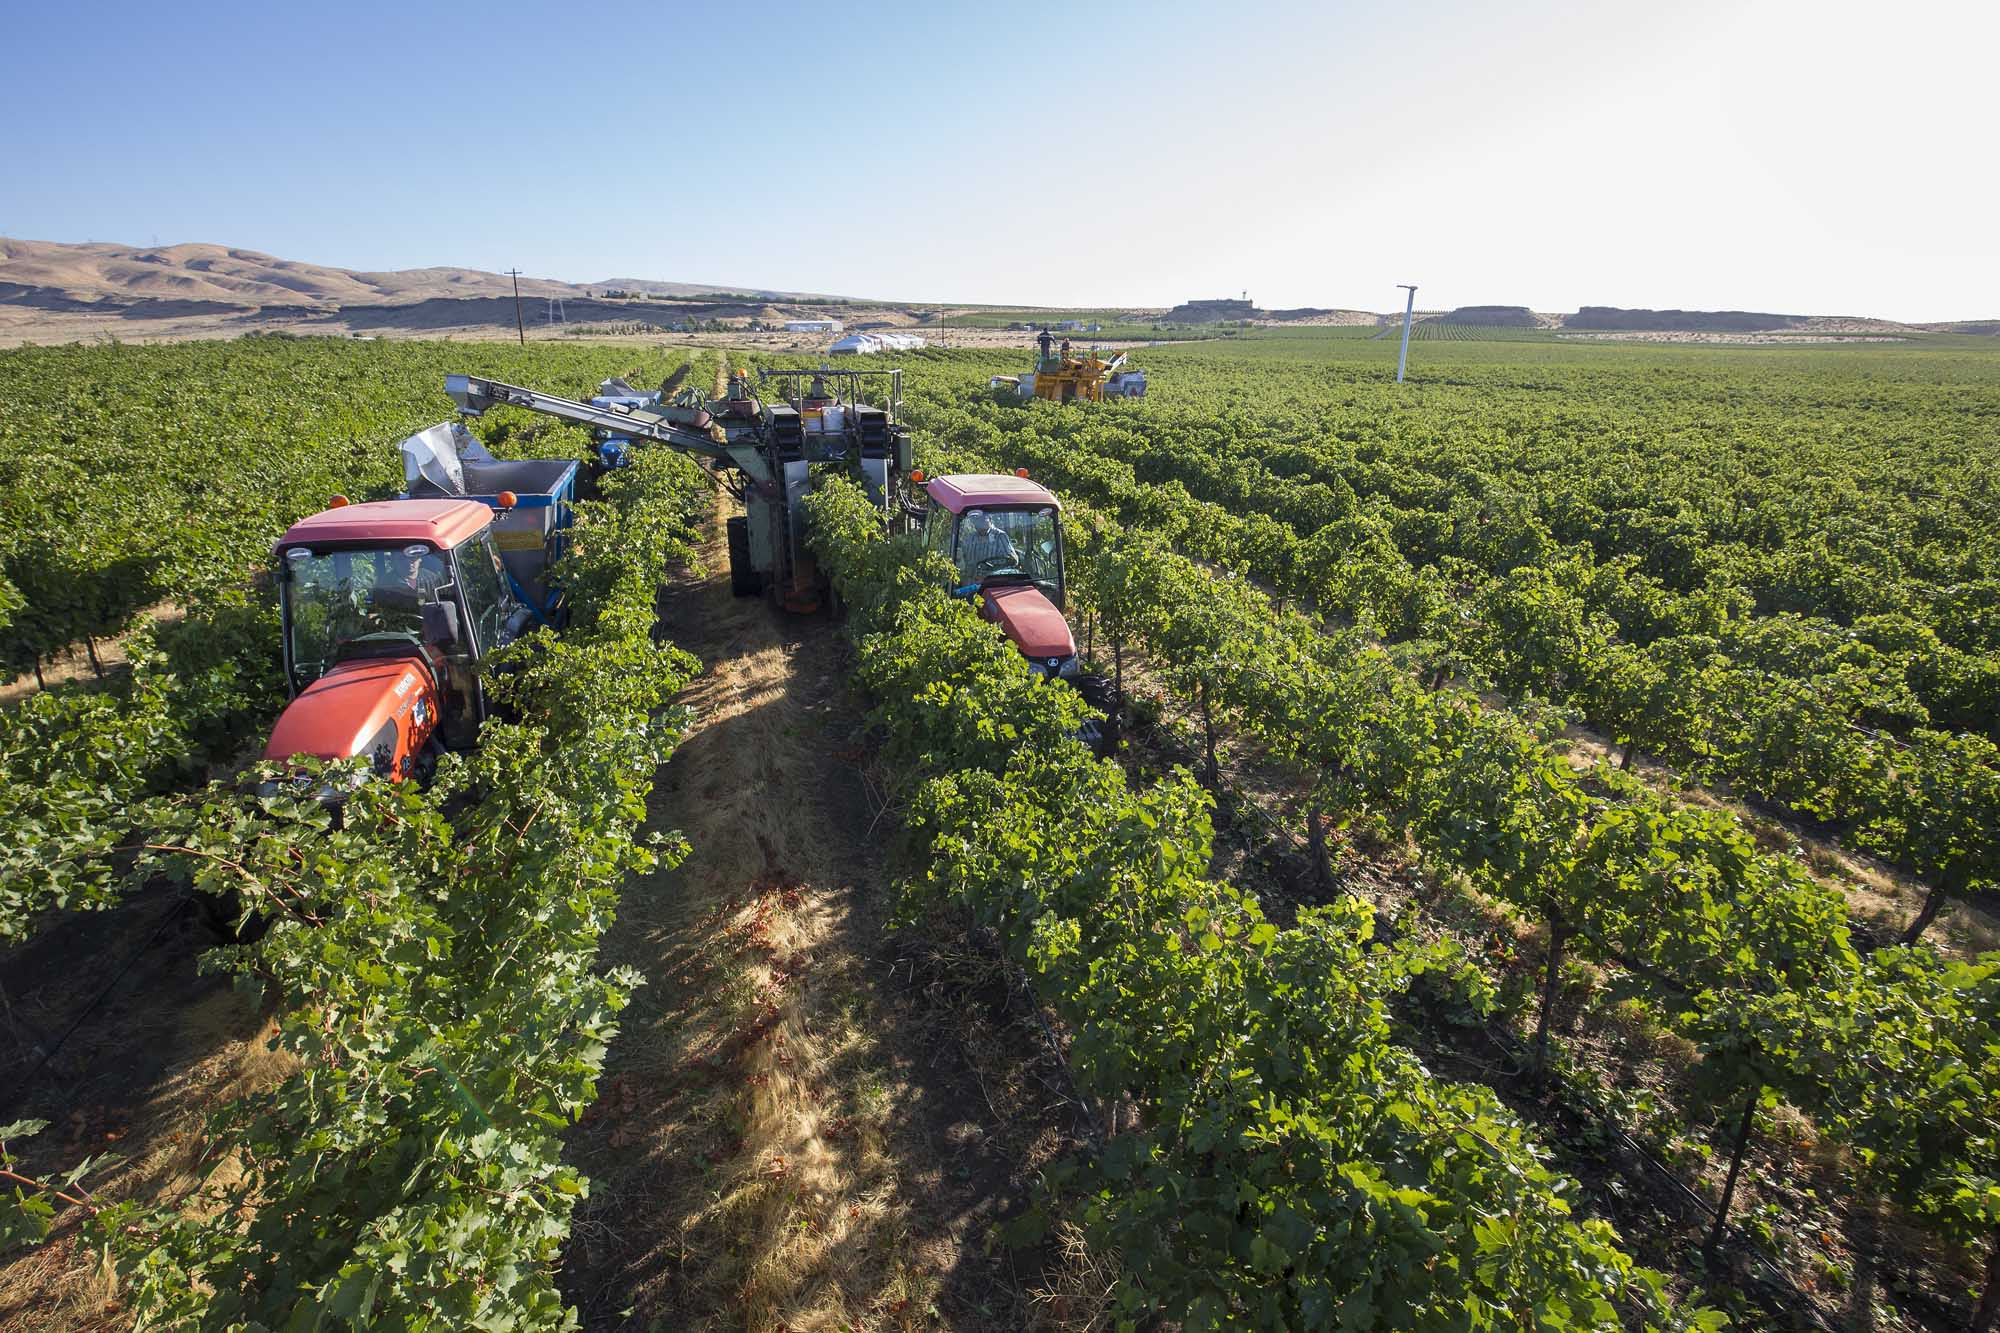 Washington turned 20,000 tons of syrah into wine last year